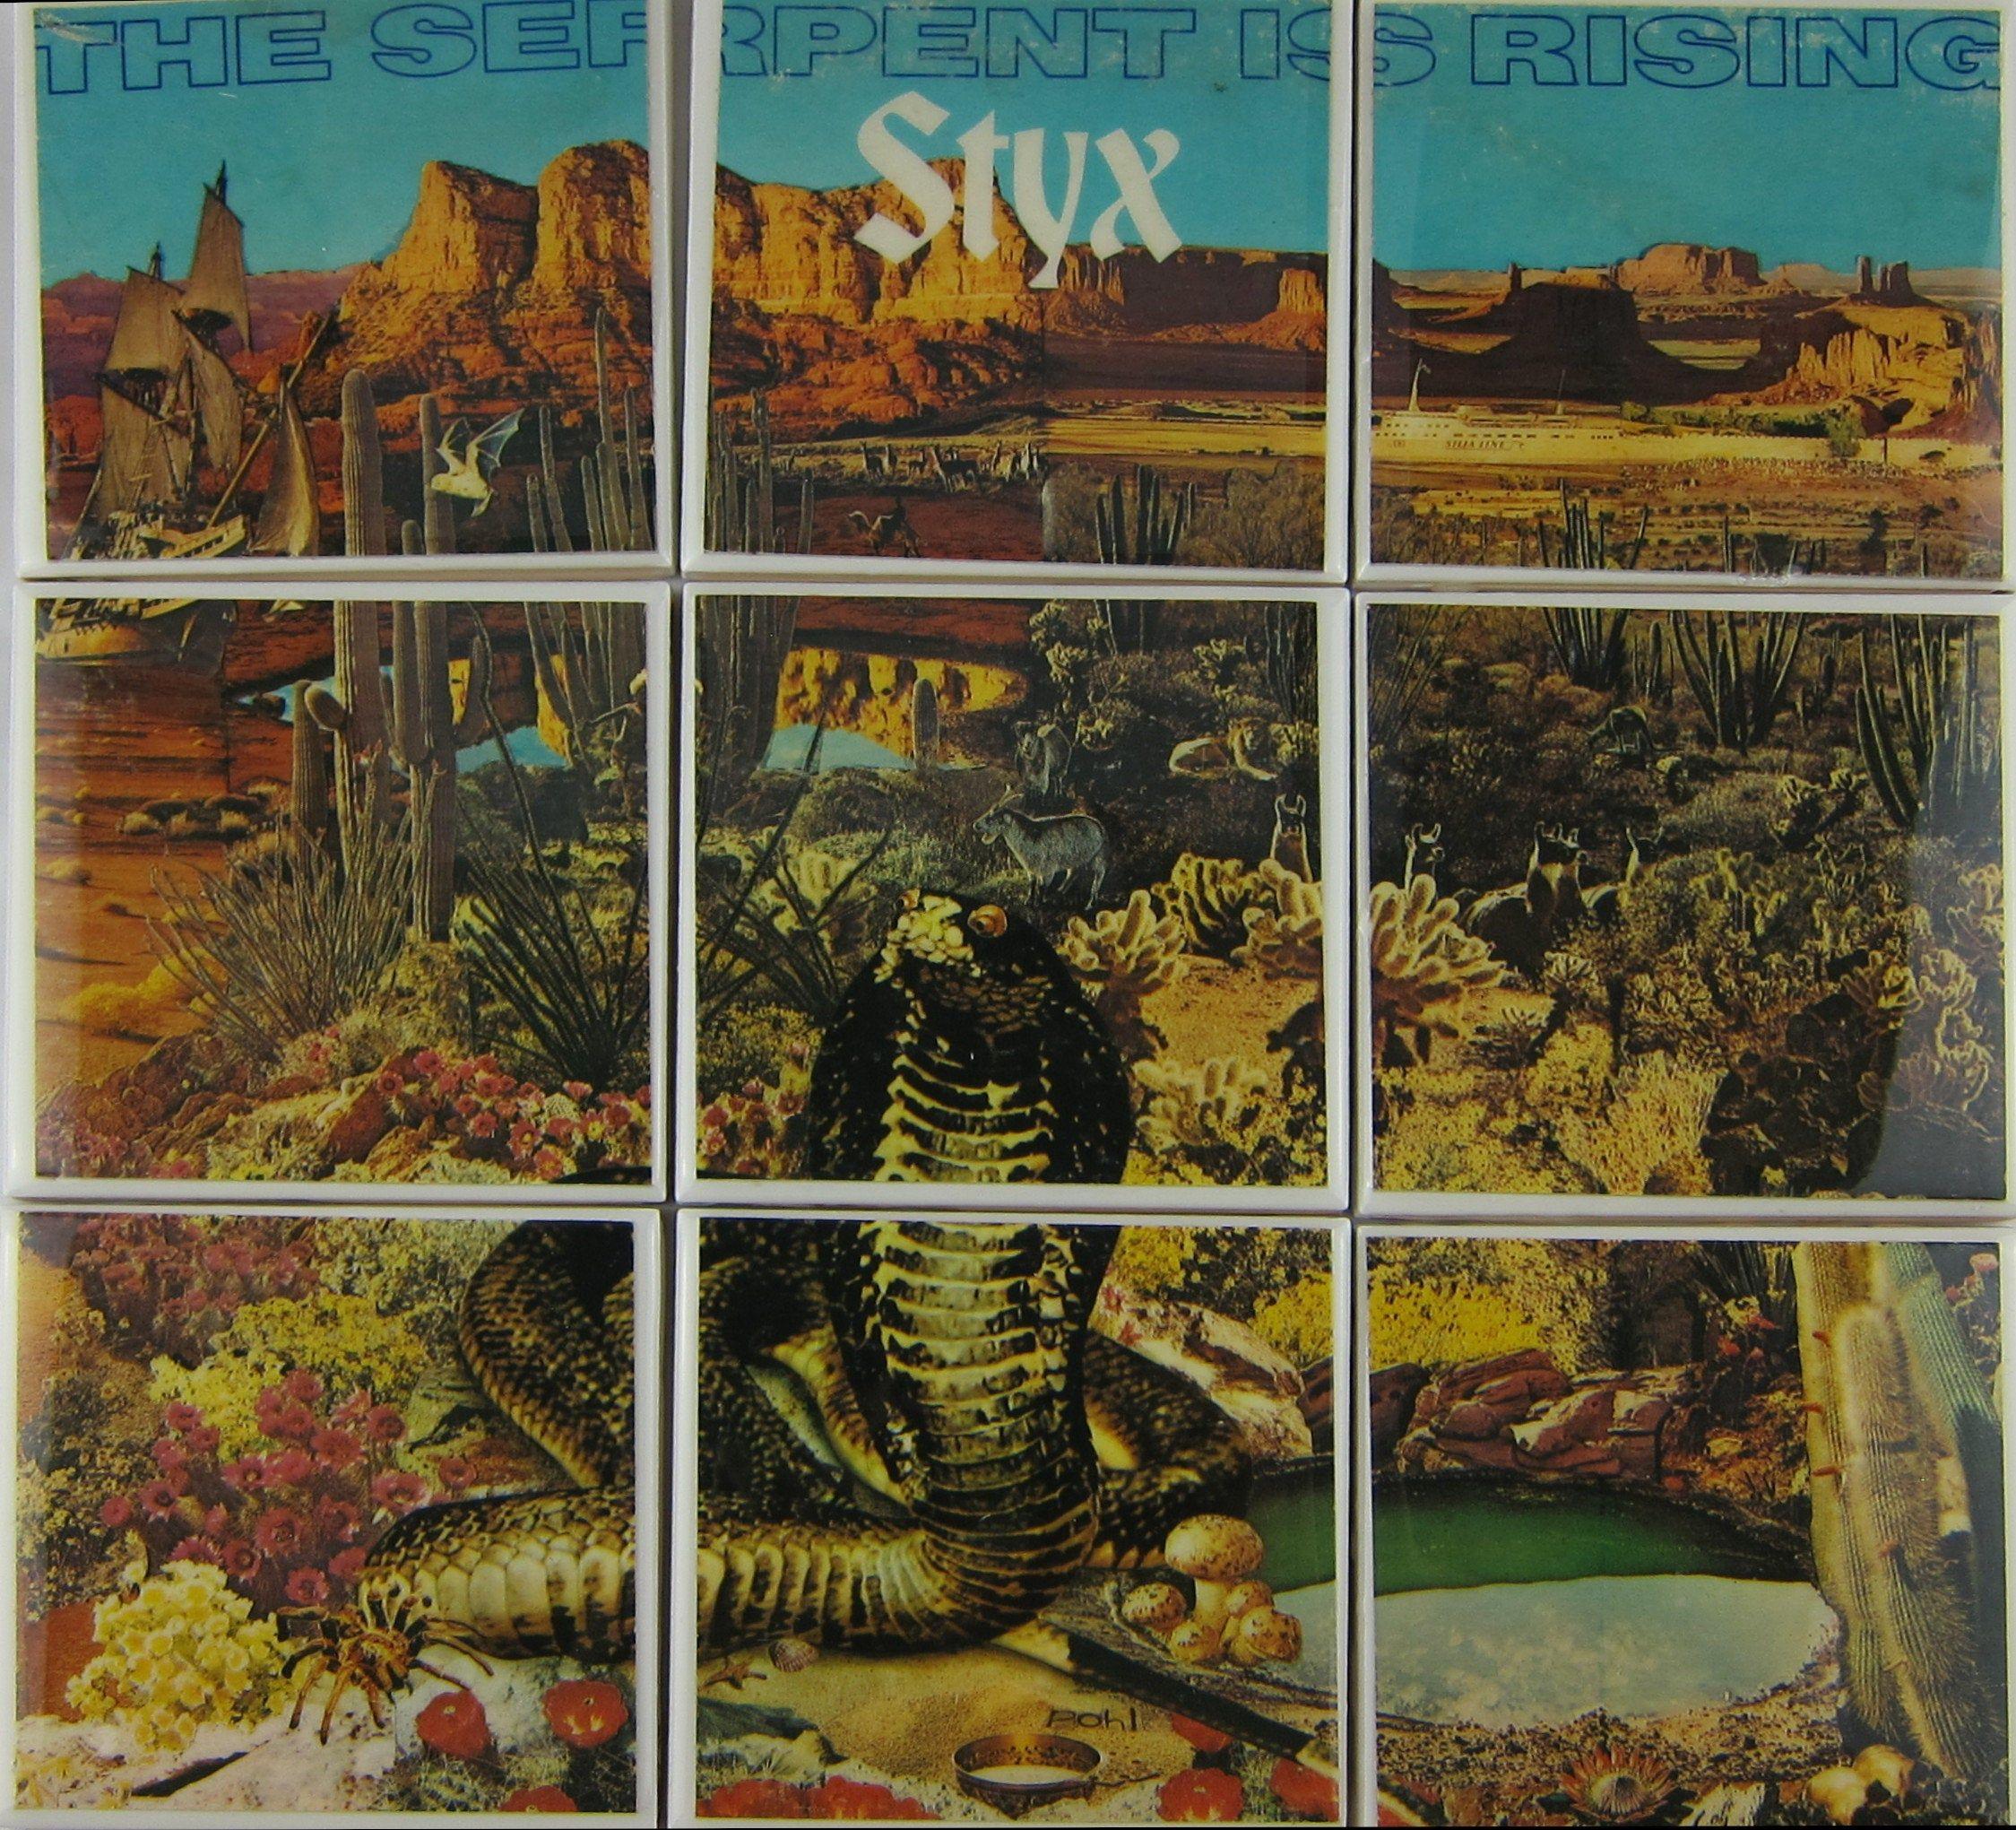 Styx Album Sleeve Coaster Tile Set Recycled Vinyl Record Etsy In 2020 Album Sleeves Used Vinyl Records Vinyl Records